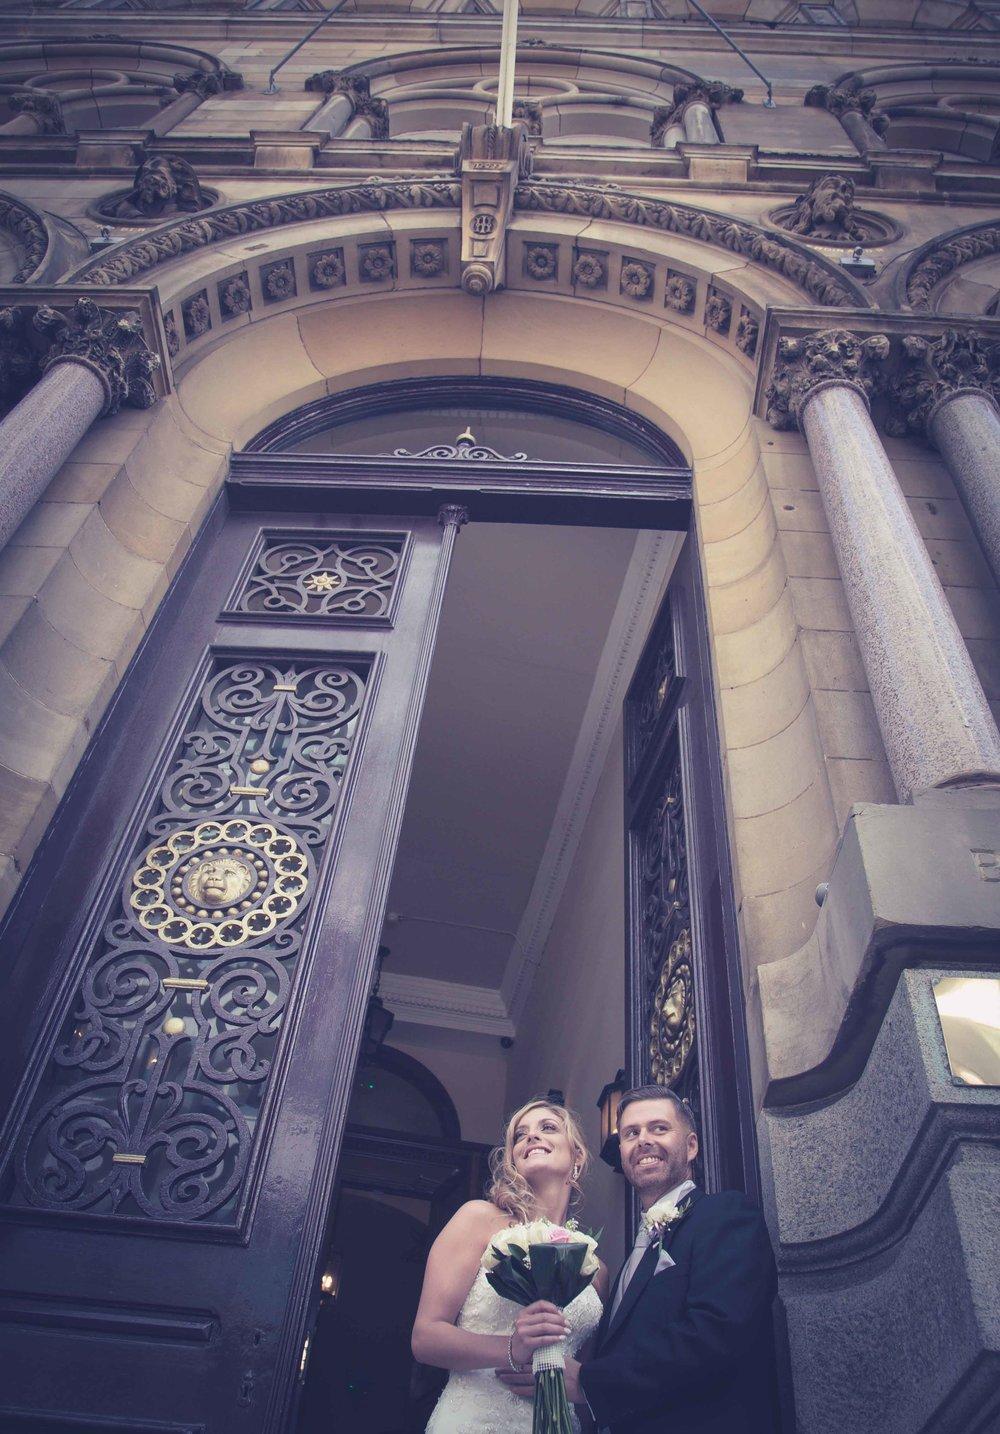 Rauquet_Club_Wedding_photography_Liverpool_heatherelizabethphotography (100 of 164).jpg